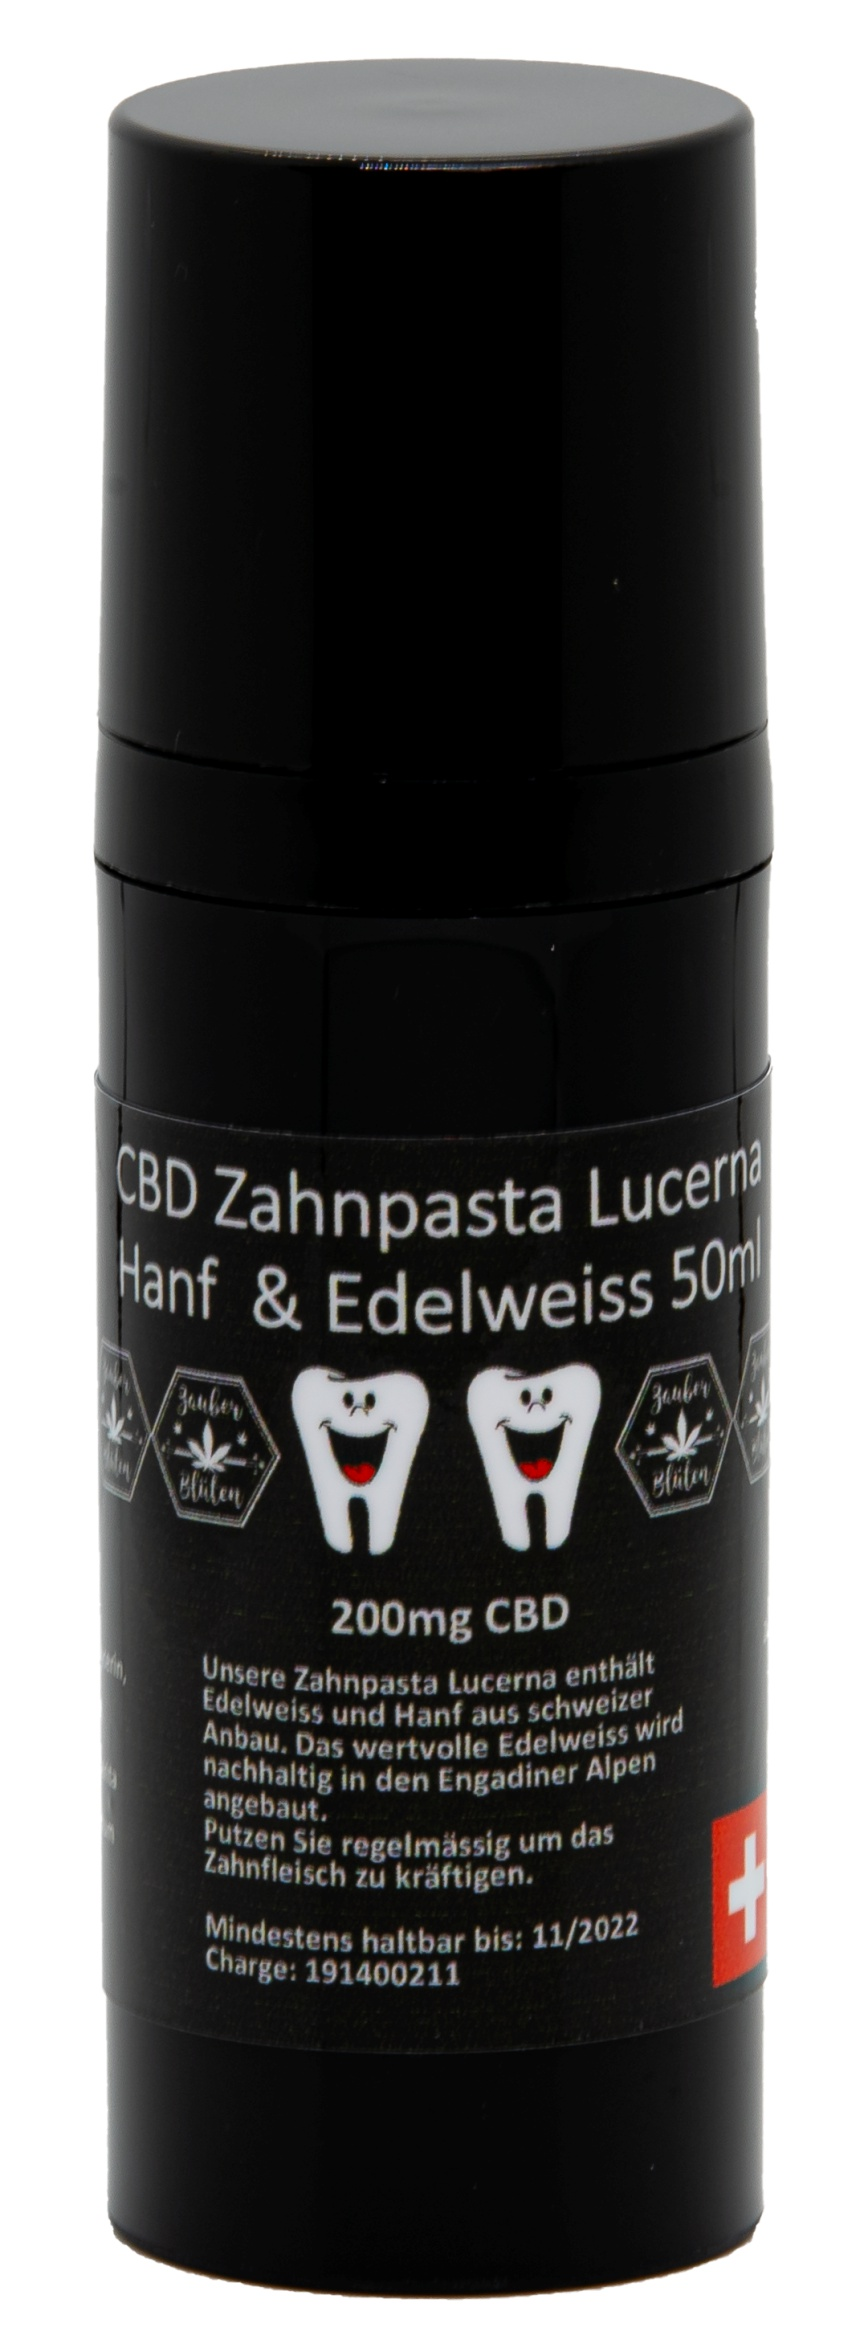 CBD-Zahnpasta Lucerna